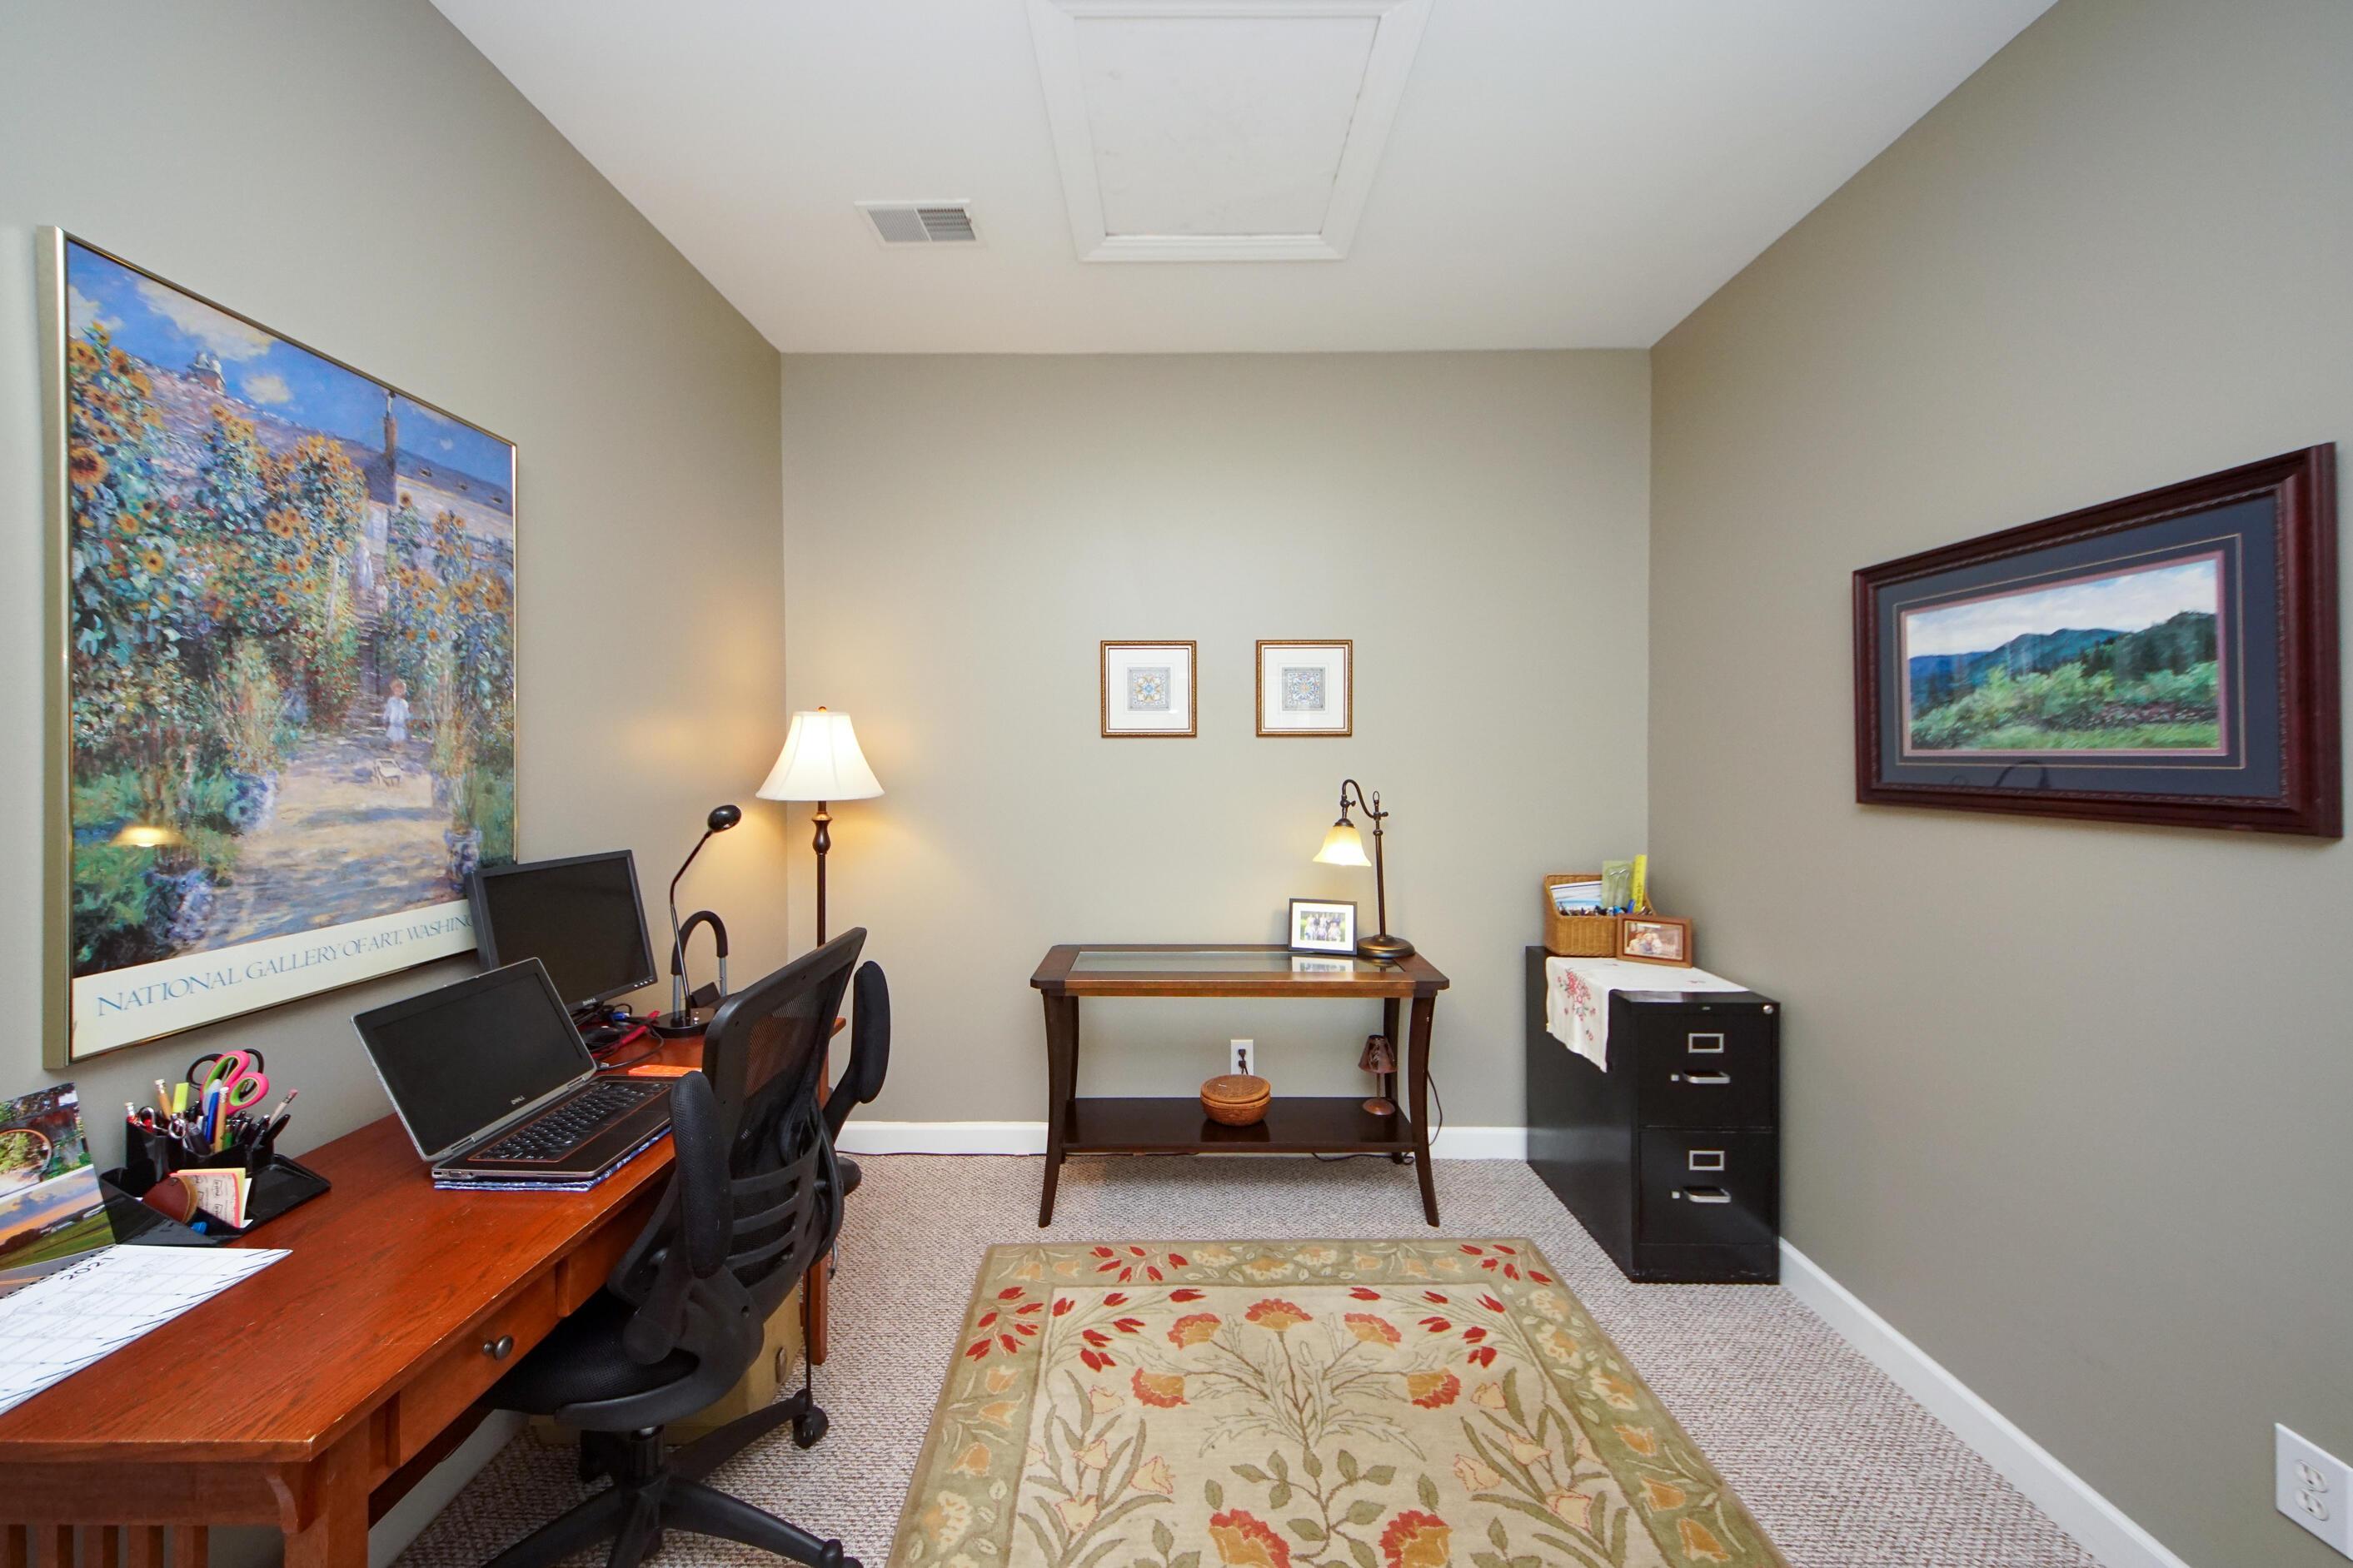 Dunes West Homes For Sale - 1631 Camfield, Mount Pleasant, SC - 31